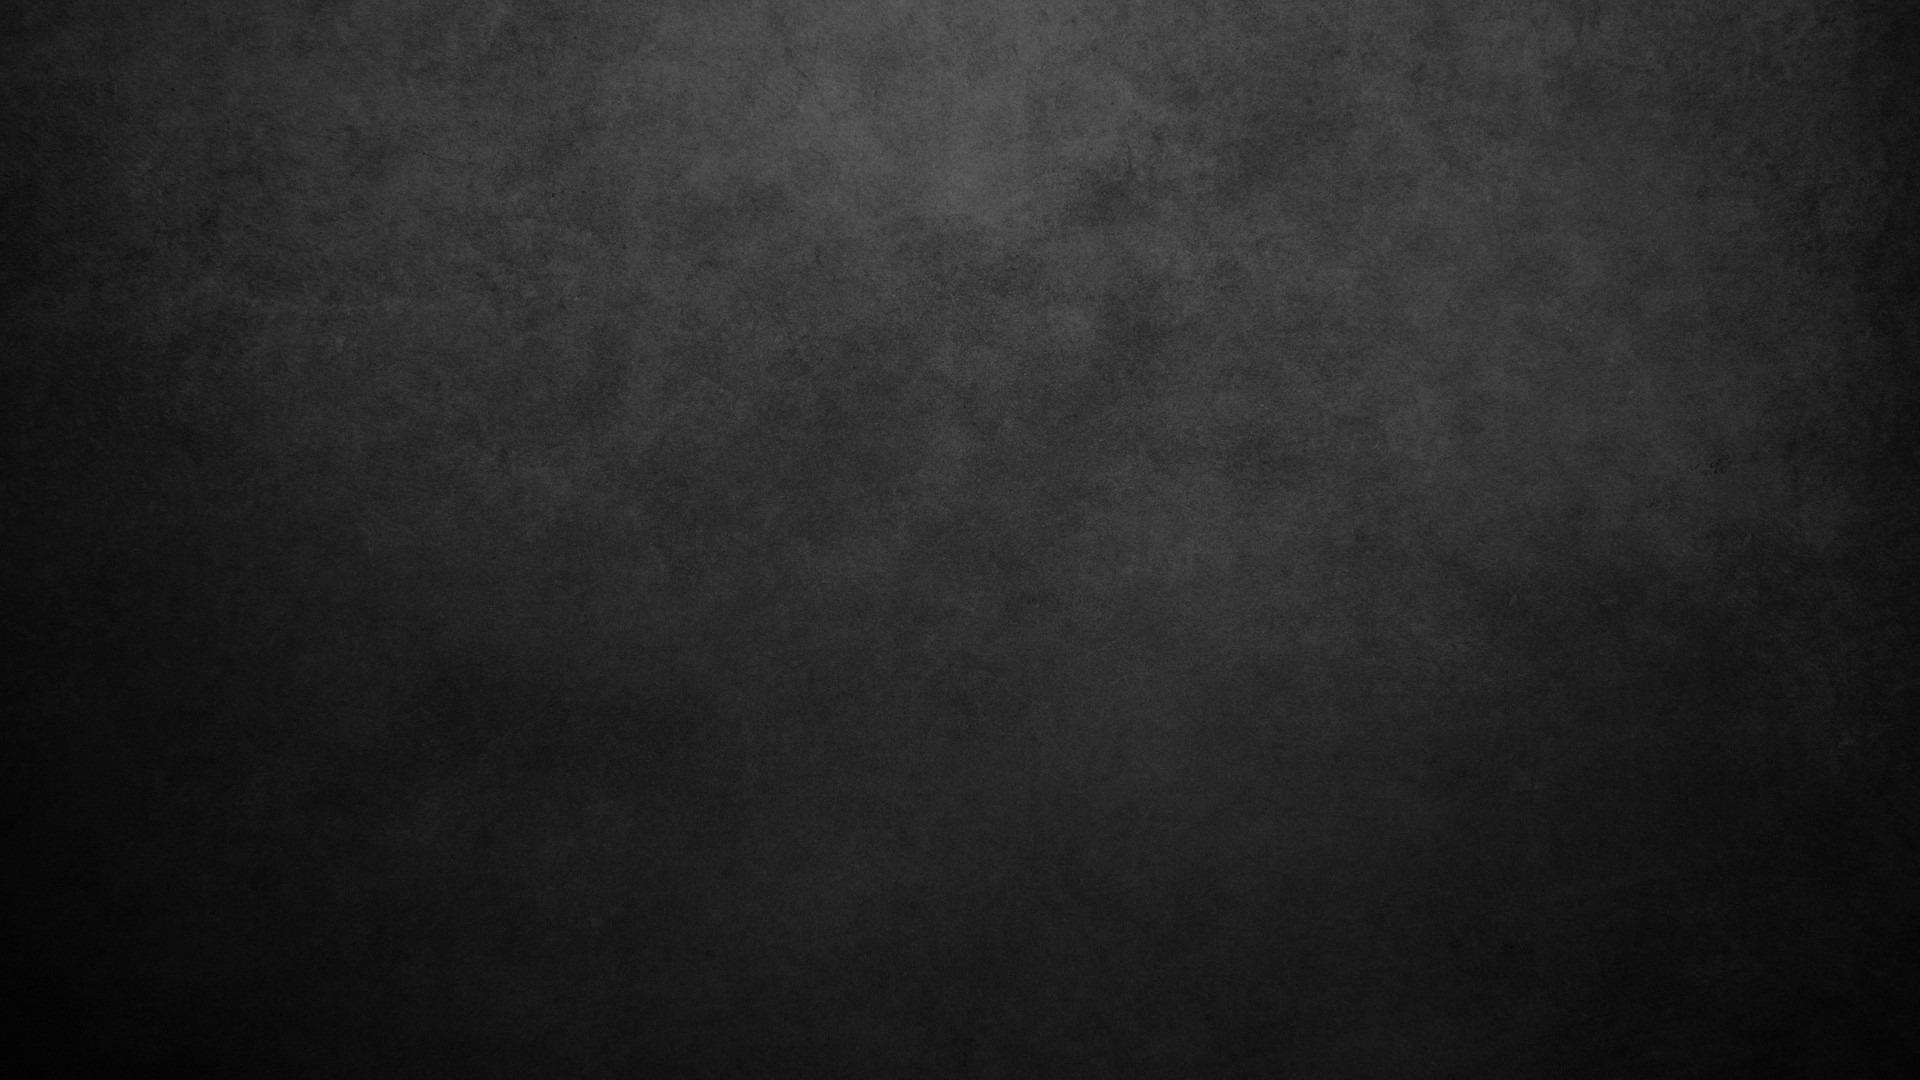 Dark Background - Red Key Real Estate Omaha